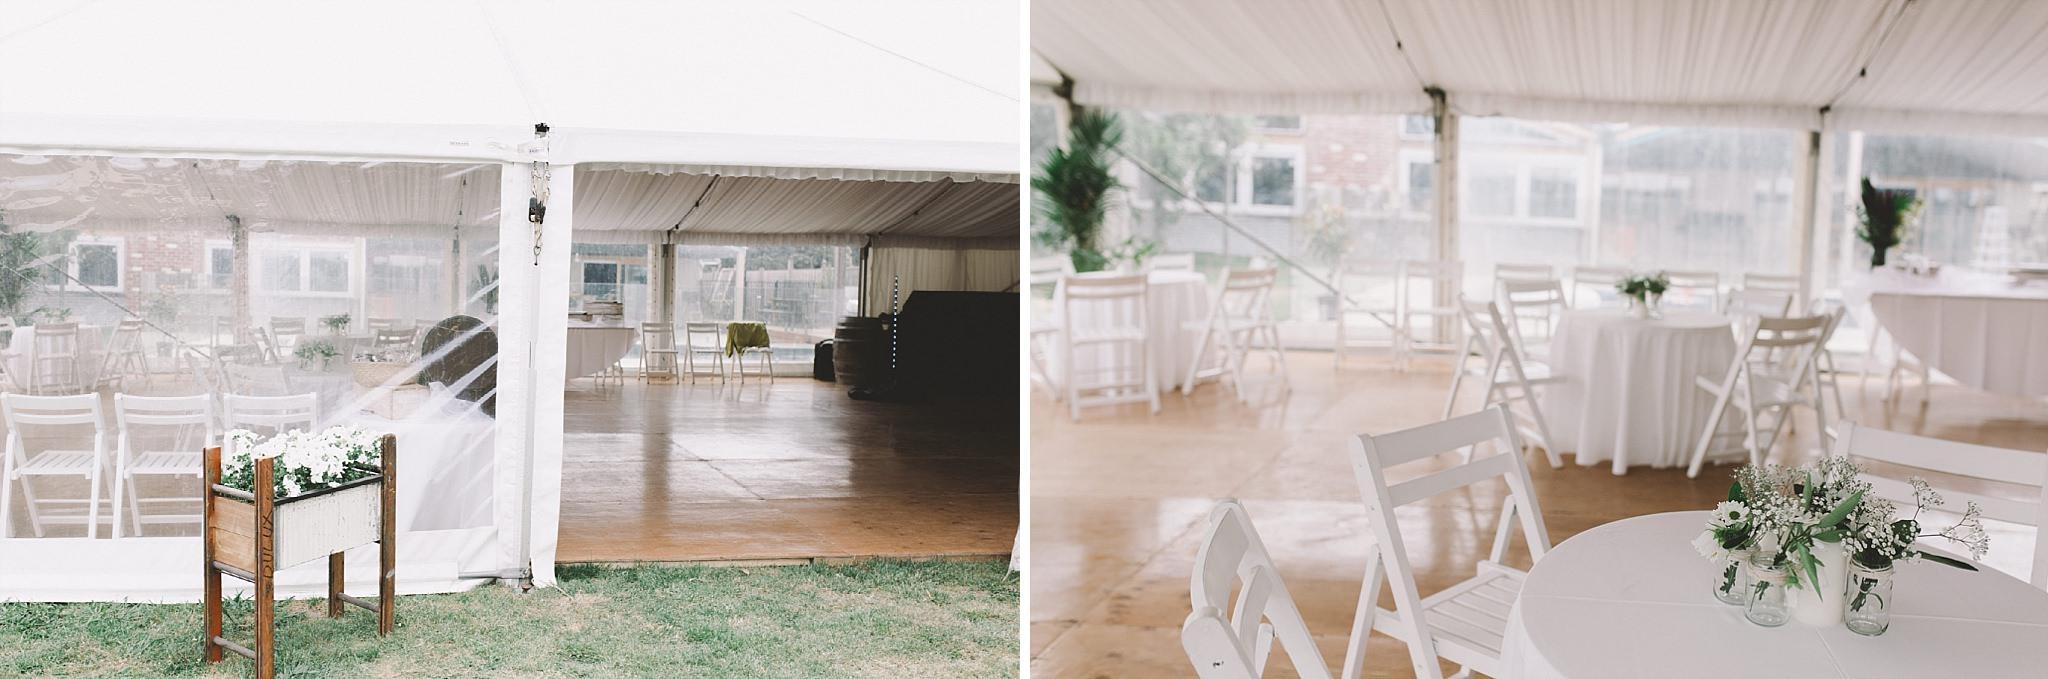 Mornington Peninsula Wedding Photographer 66.JPG